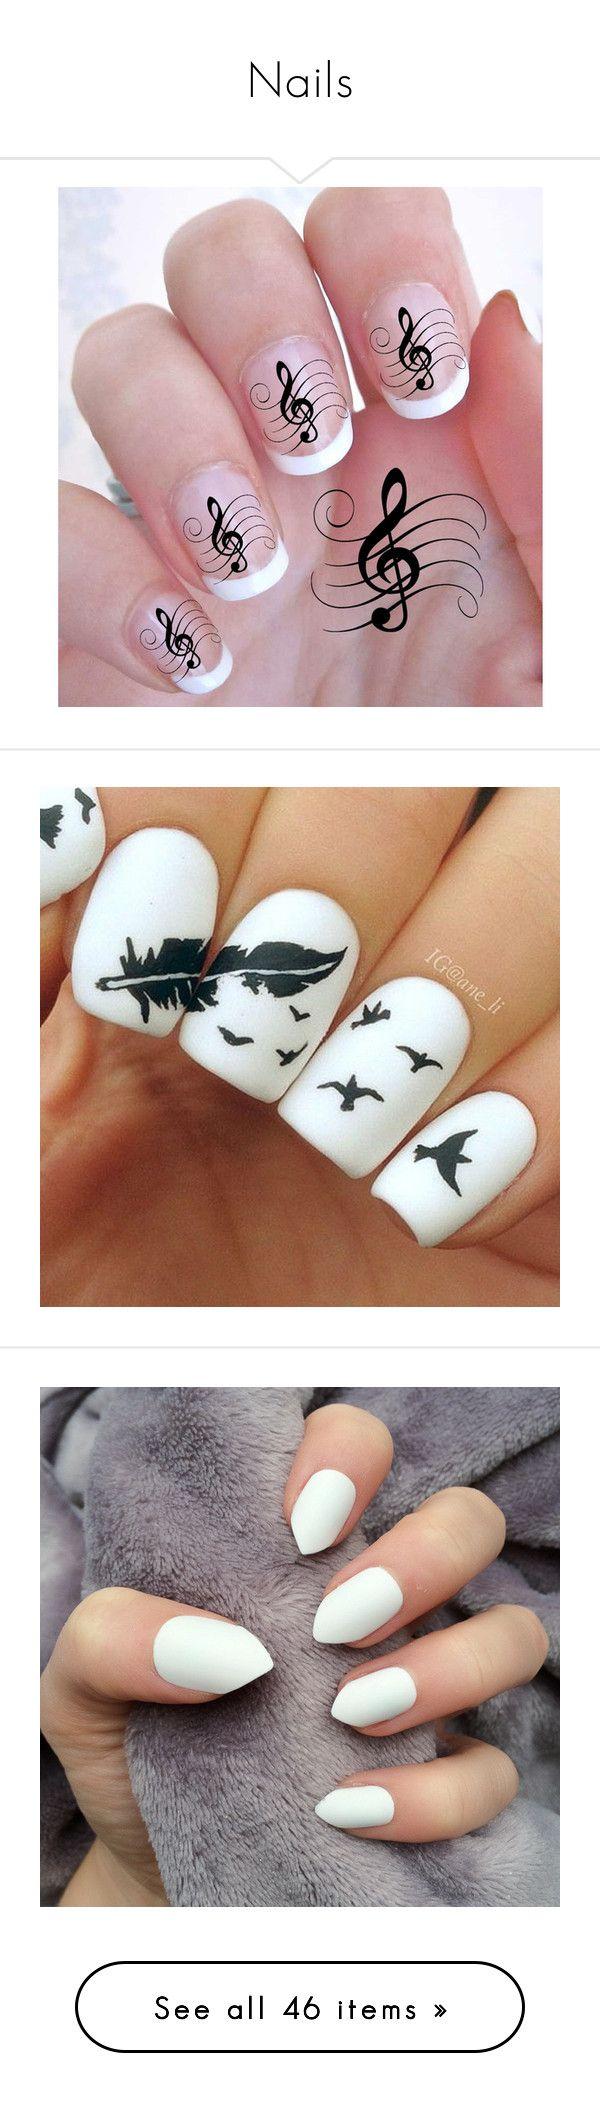 """Nails"" by emo-kyleigh ❤ liked on Polyvore featuring beauty products, nail care, nail treatments, nails, makeup, beauty, nail polish, nail art, bath & beauty and grey"